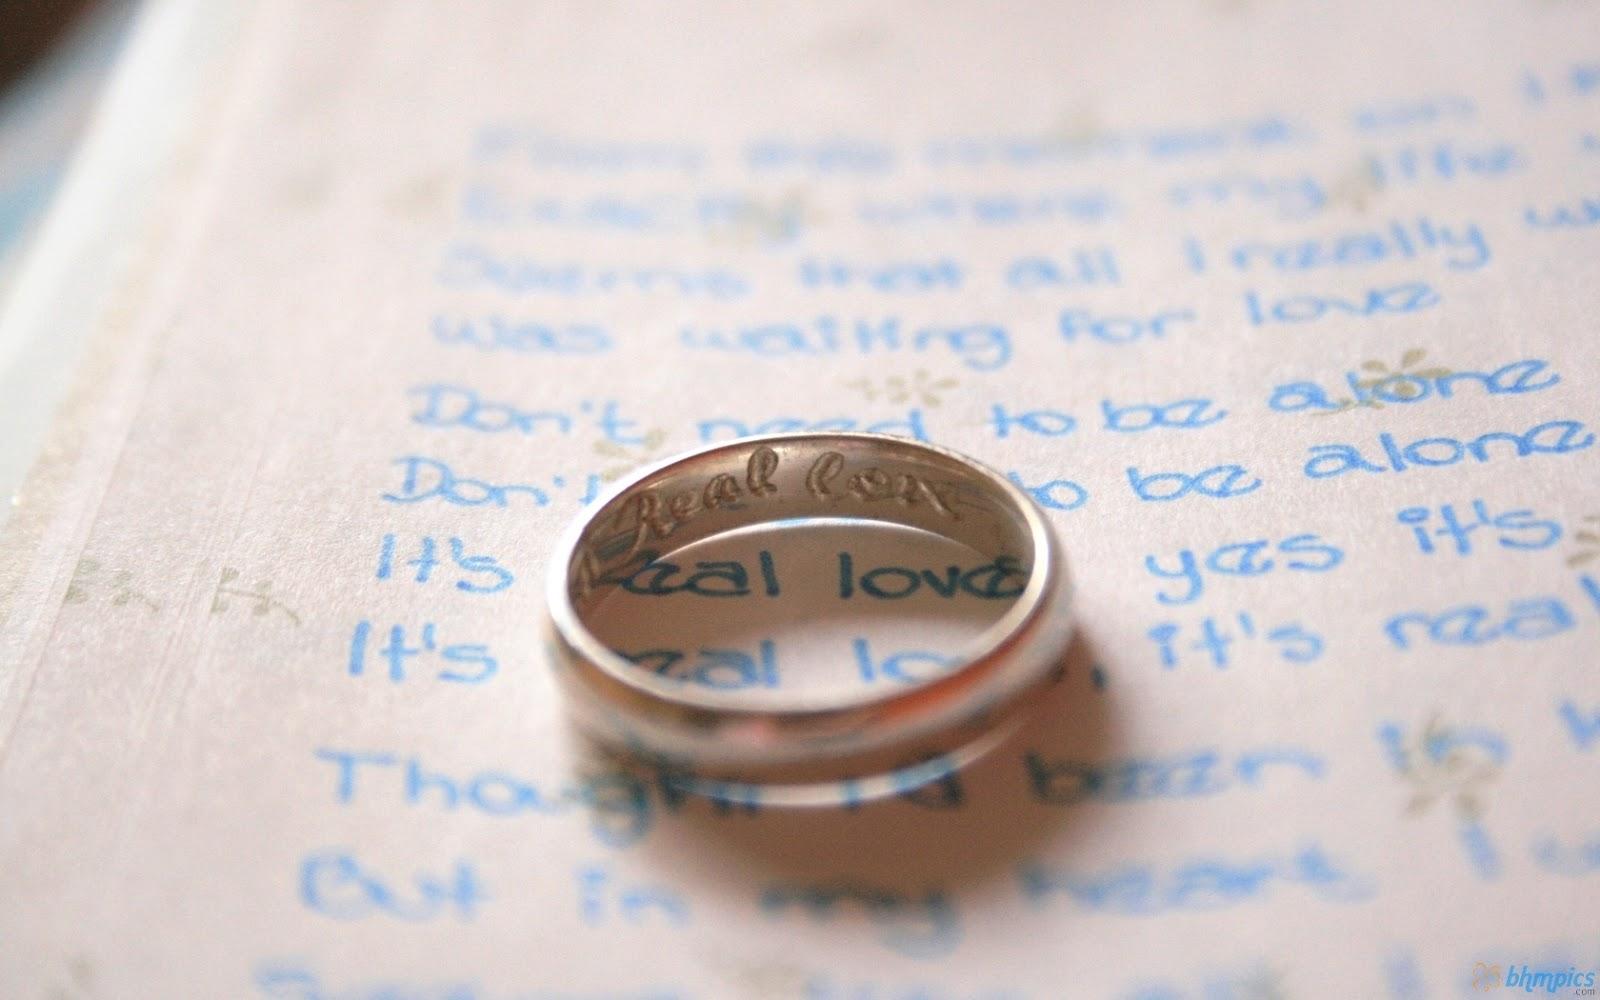 http://3.bp.blogspot.com/-G_qsqKGGMog/UIol0S48d9I/AAAAAAAAGqQ/YAs9UvRjaY4/s1600/wedding_ring_paper-1680x1050.jpg